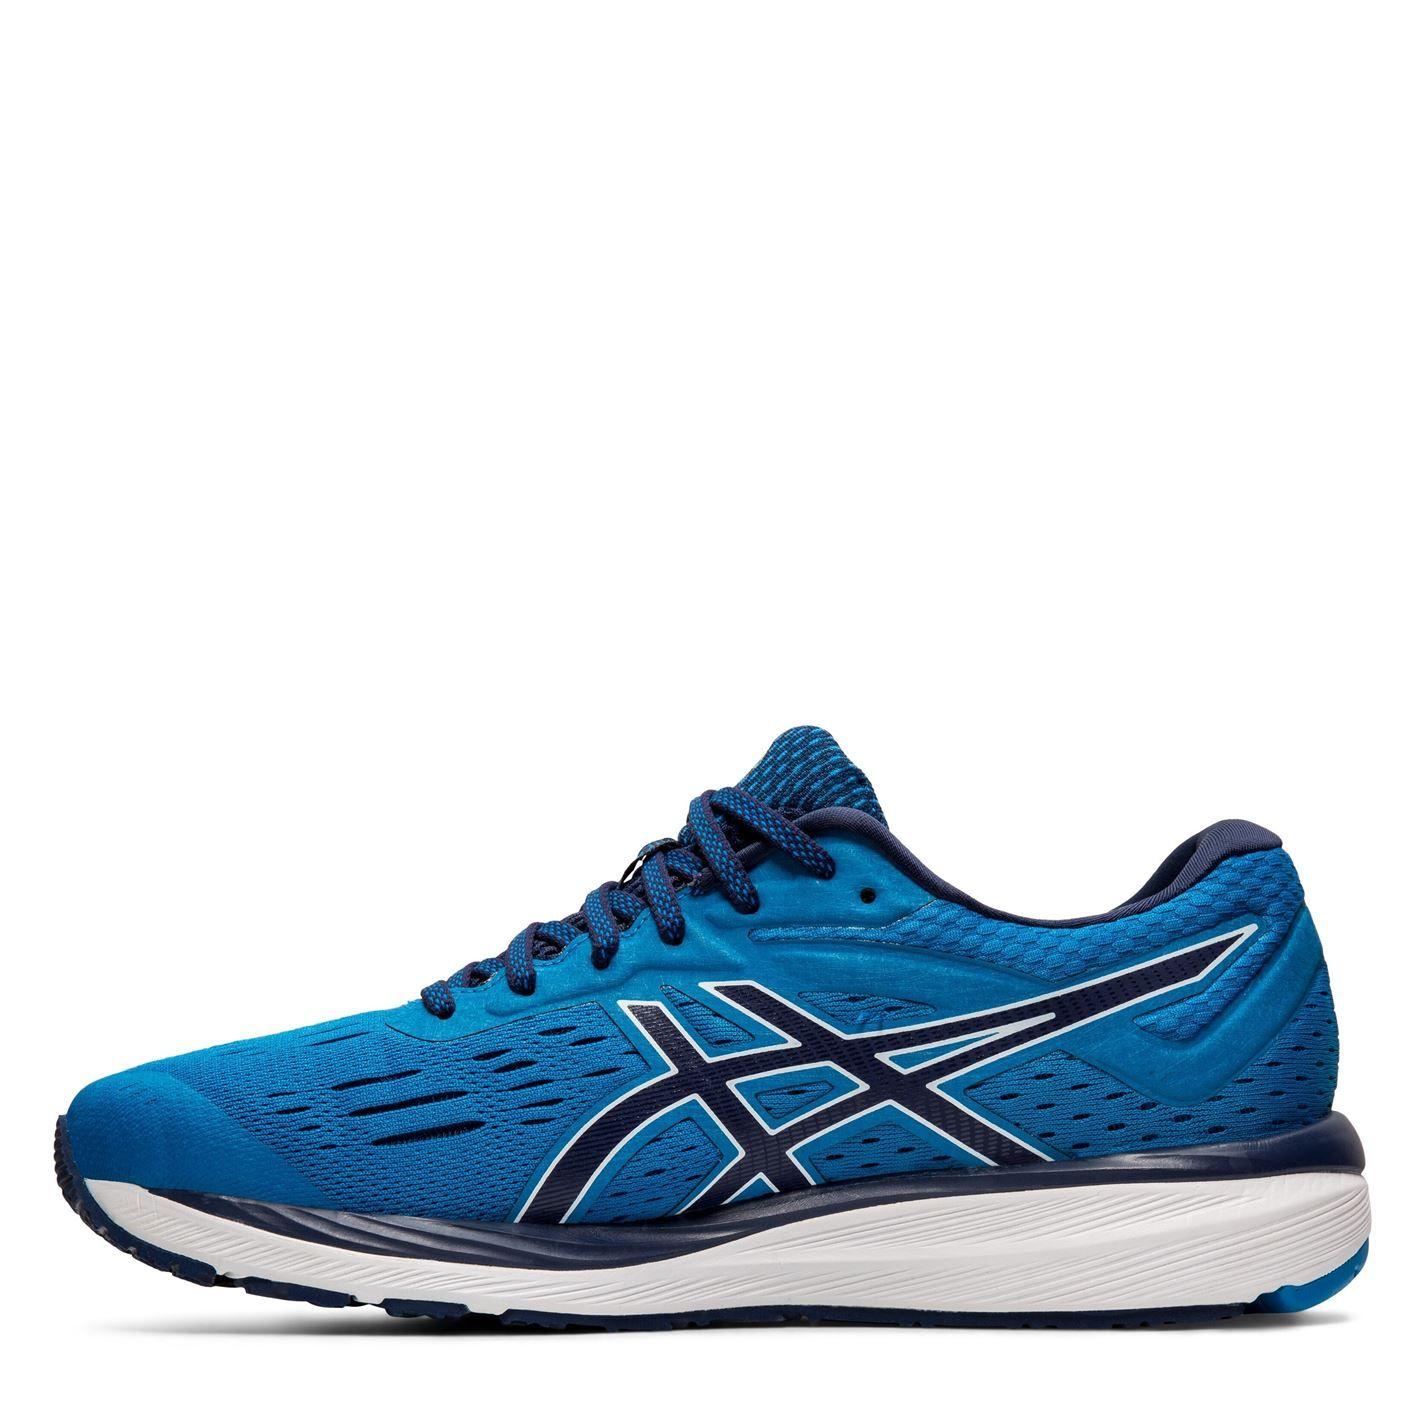 Asics Mens Gel-Cumulus 20 Running Shoes Trainers